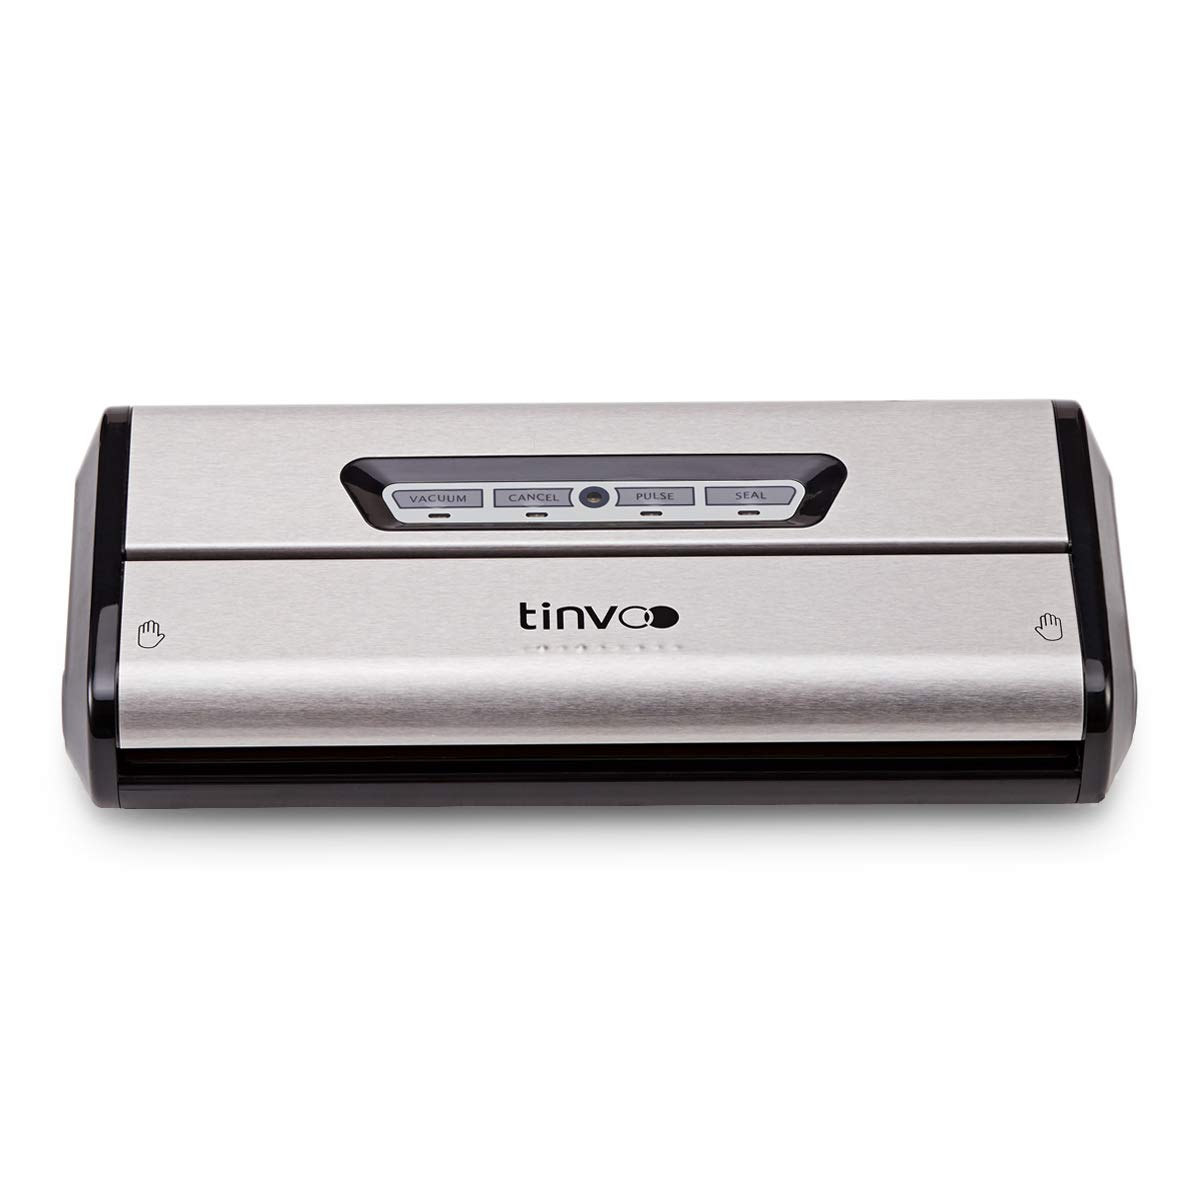 TINVOO VS100S Vacuum Sealer Machine Upgrade Automatic Food Sealer Machine with Starter Kit for Food Preservation,Sous Vide Vacuum Sealer System (Sliver/Stainless Steel)